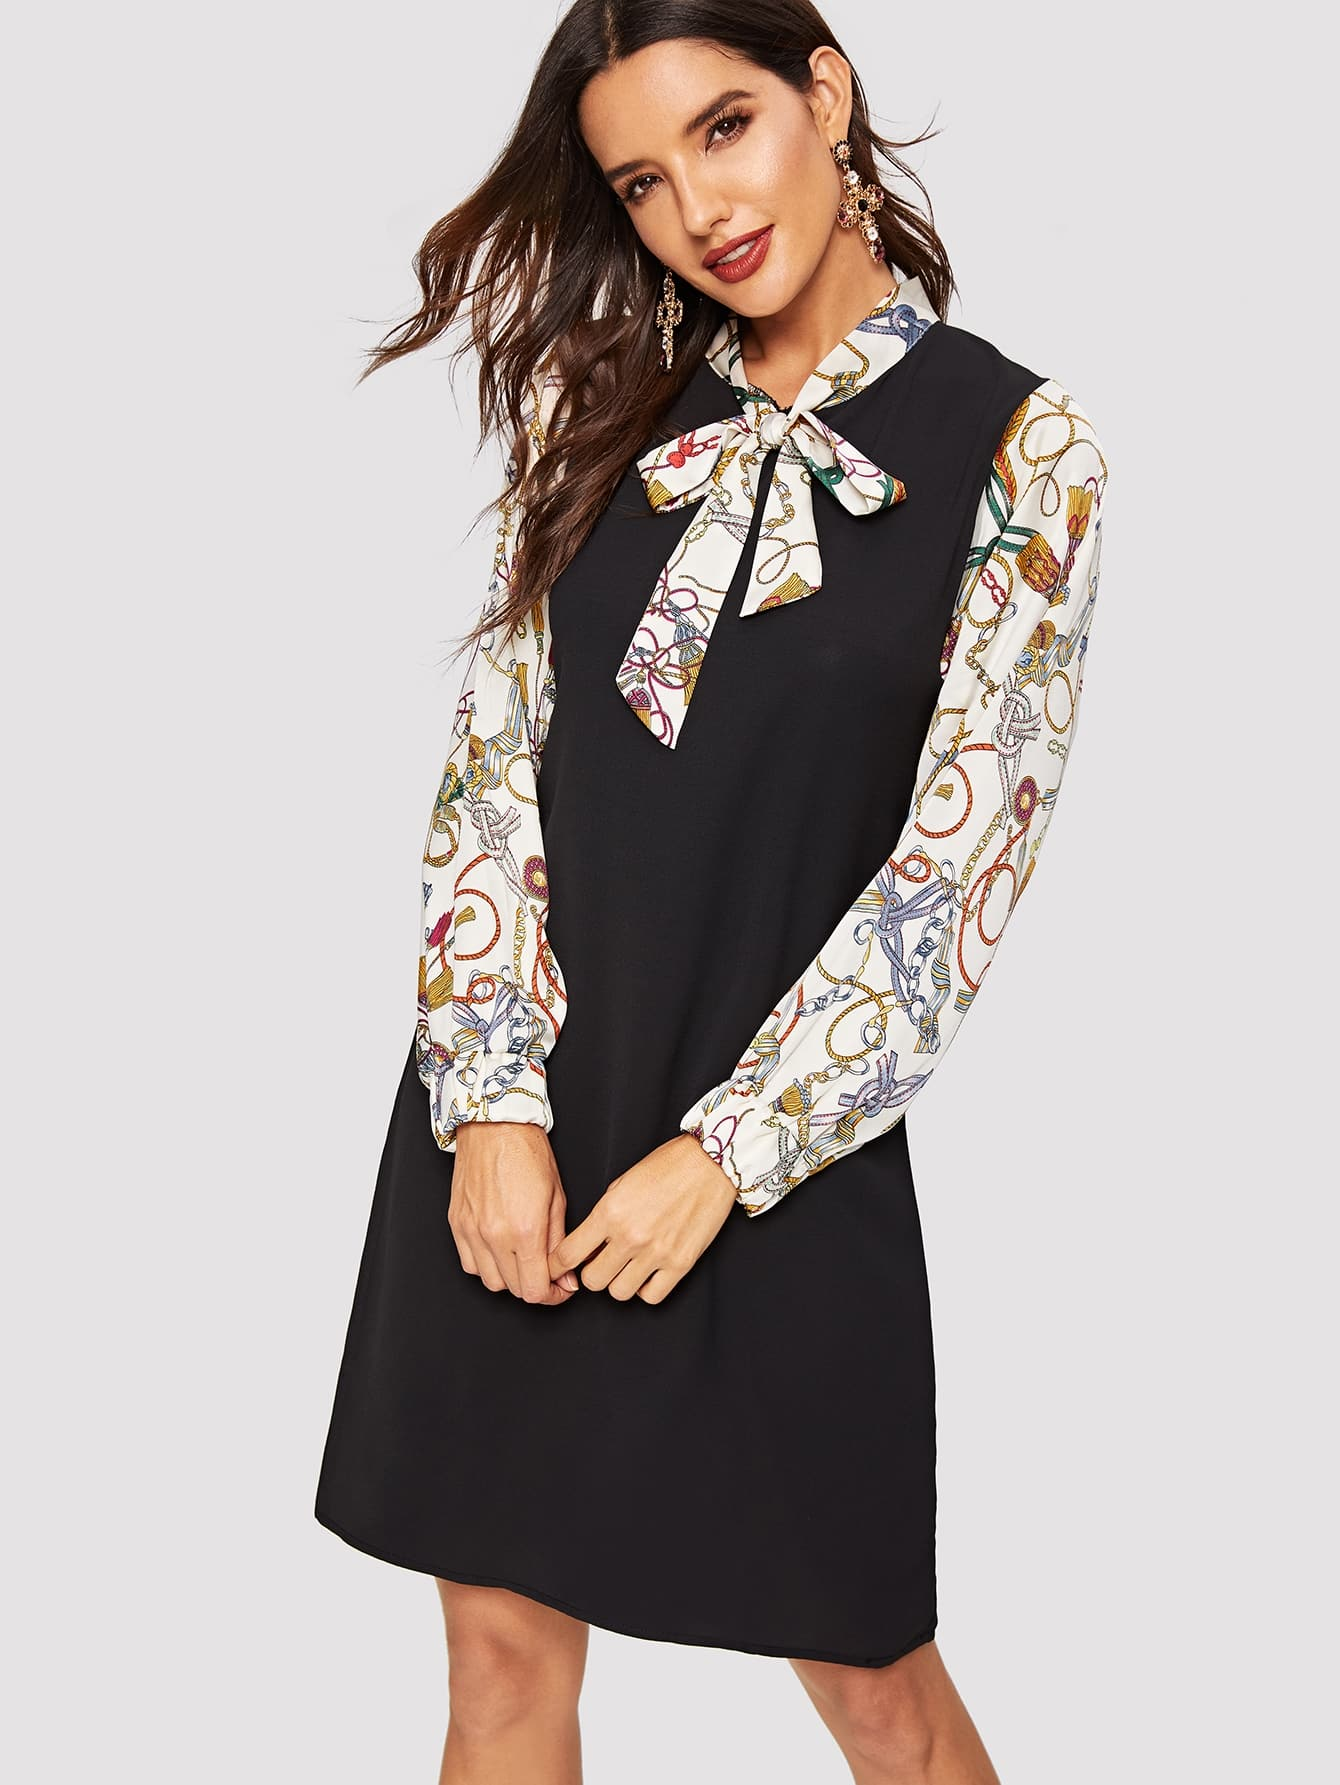 50s Ribbon Tie Dip Hem Flare Lace Dress null